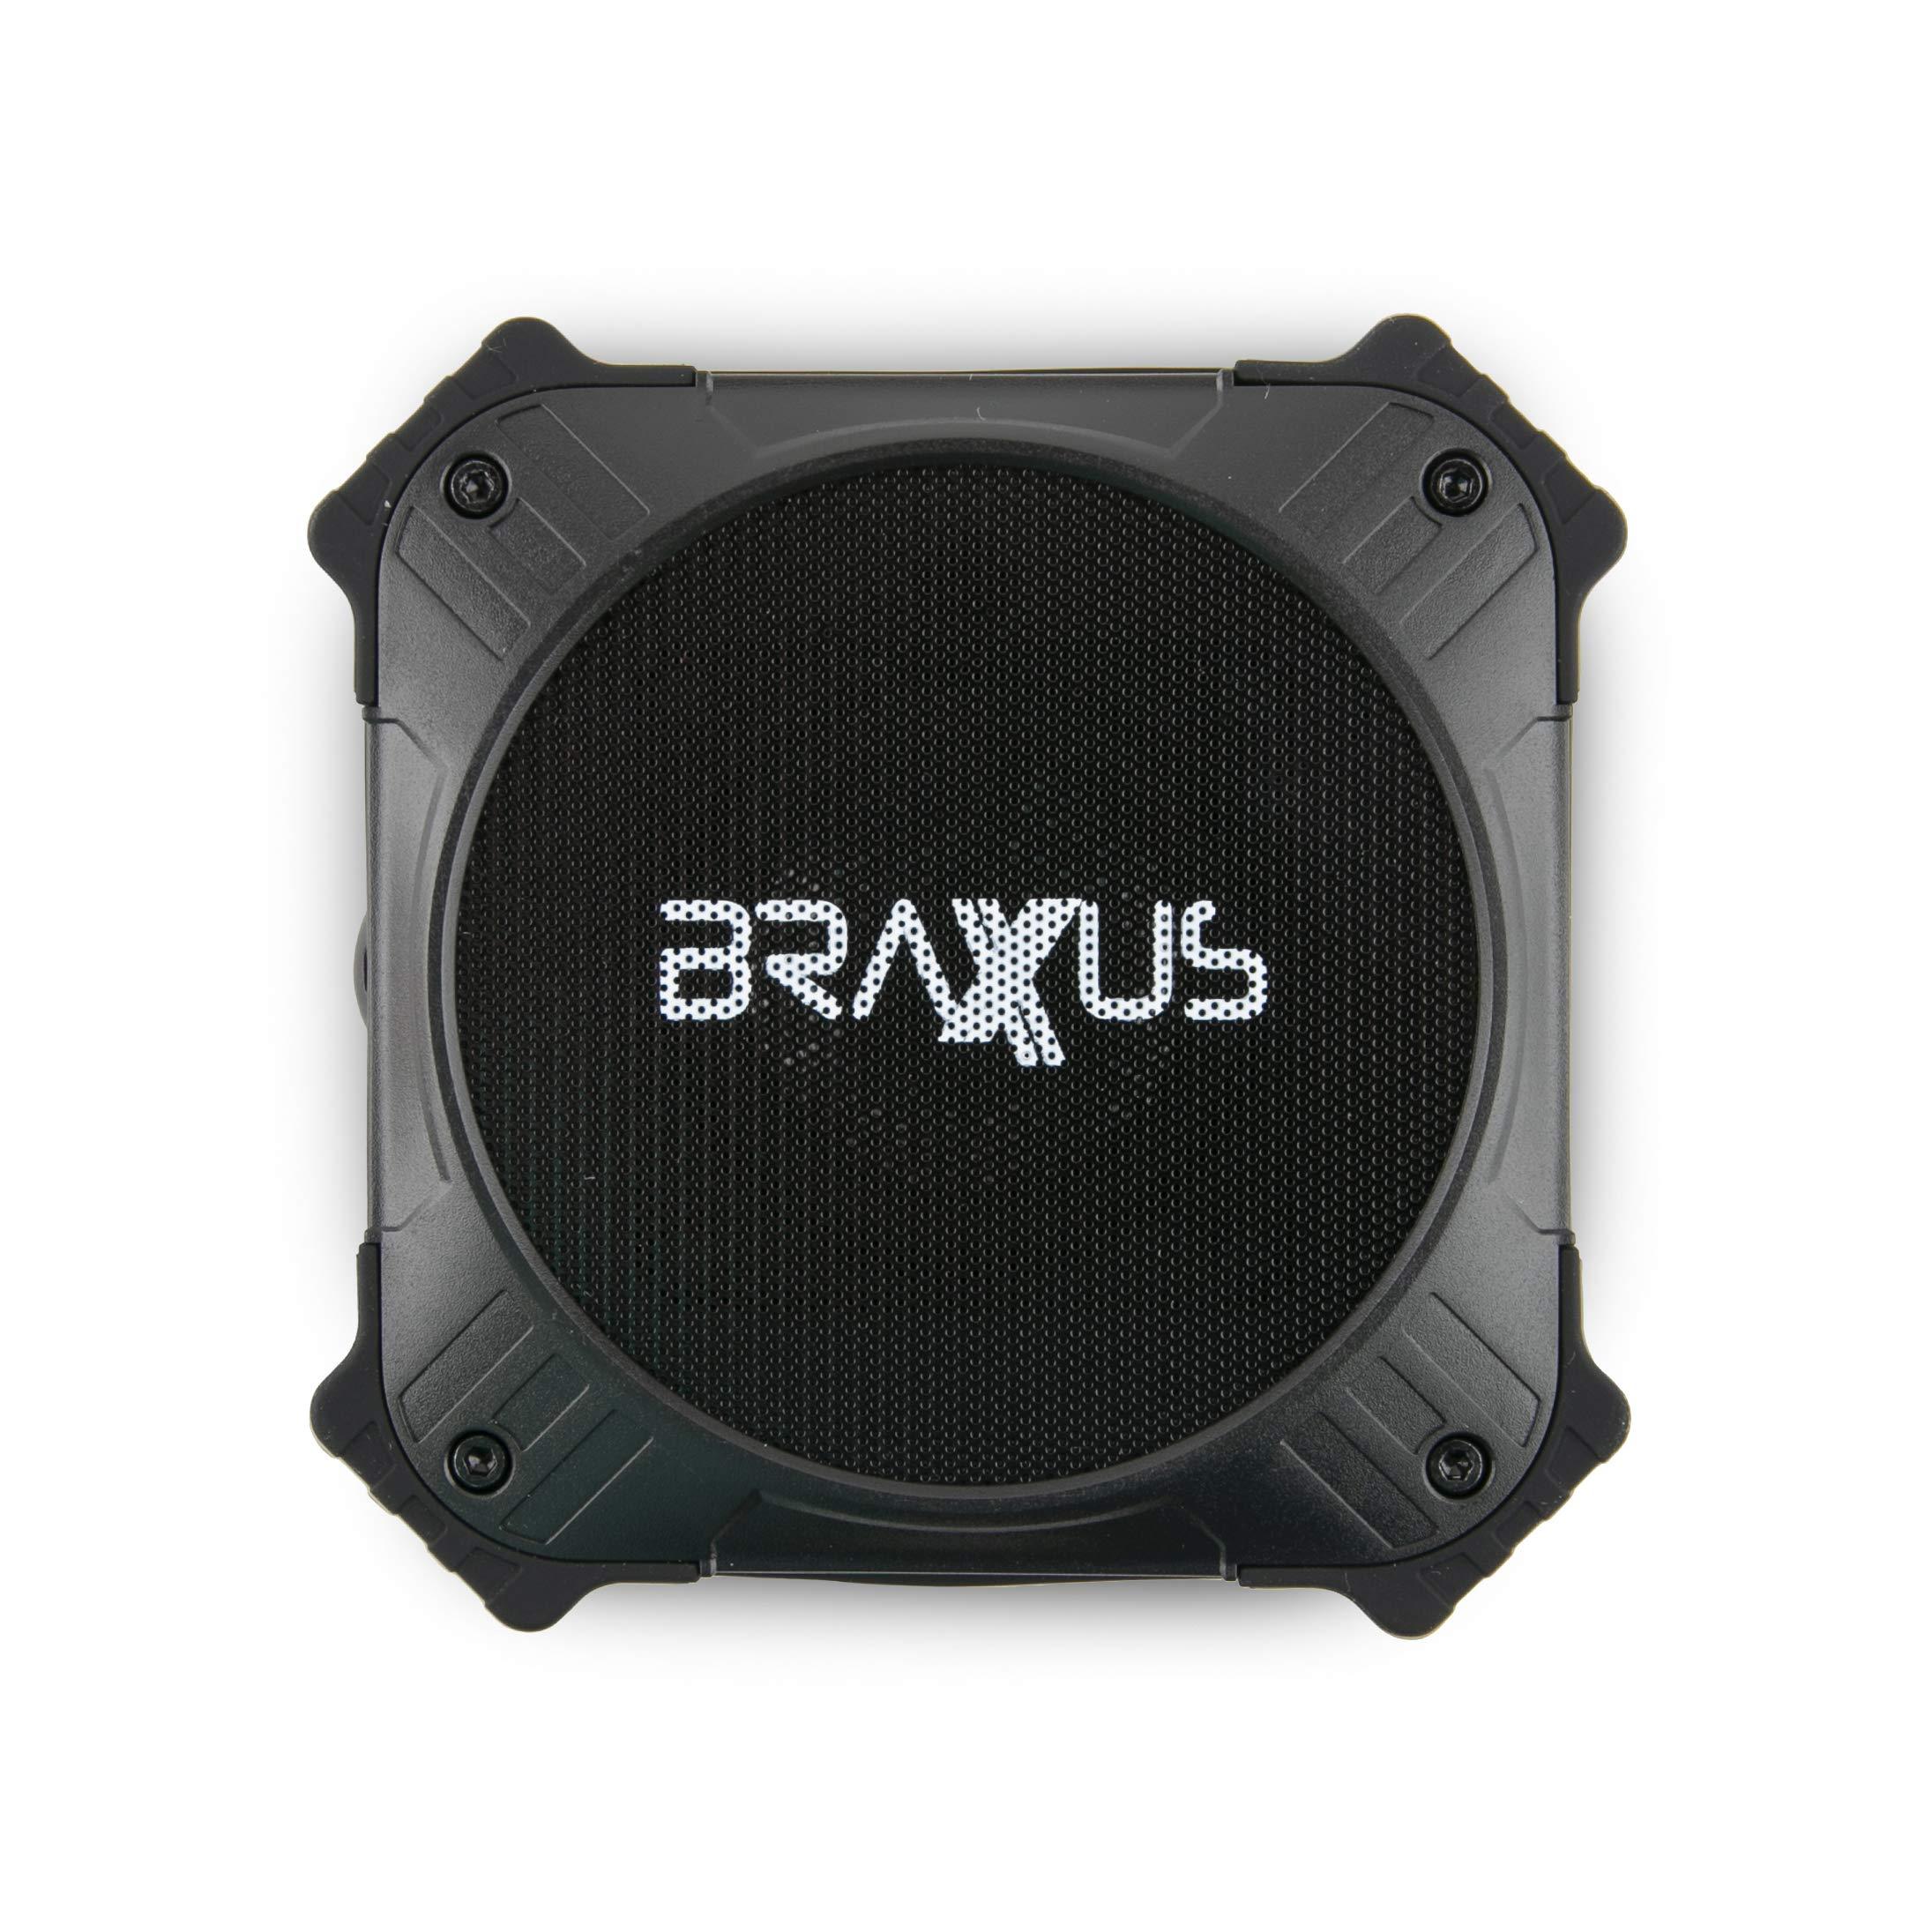 Braxus Solar Portable Bluetooth Speaker 5W, 12+ Hours Playtime Portable Speaker Solar Charger IPX6 Waterproof Wireless Bluetooth 4.2 Speaker, 2000mAh Power Bank for Outdoor Life - Solar Power Bank by Braxus